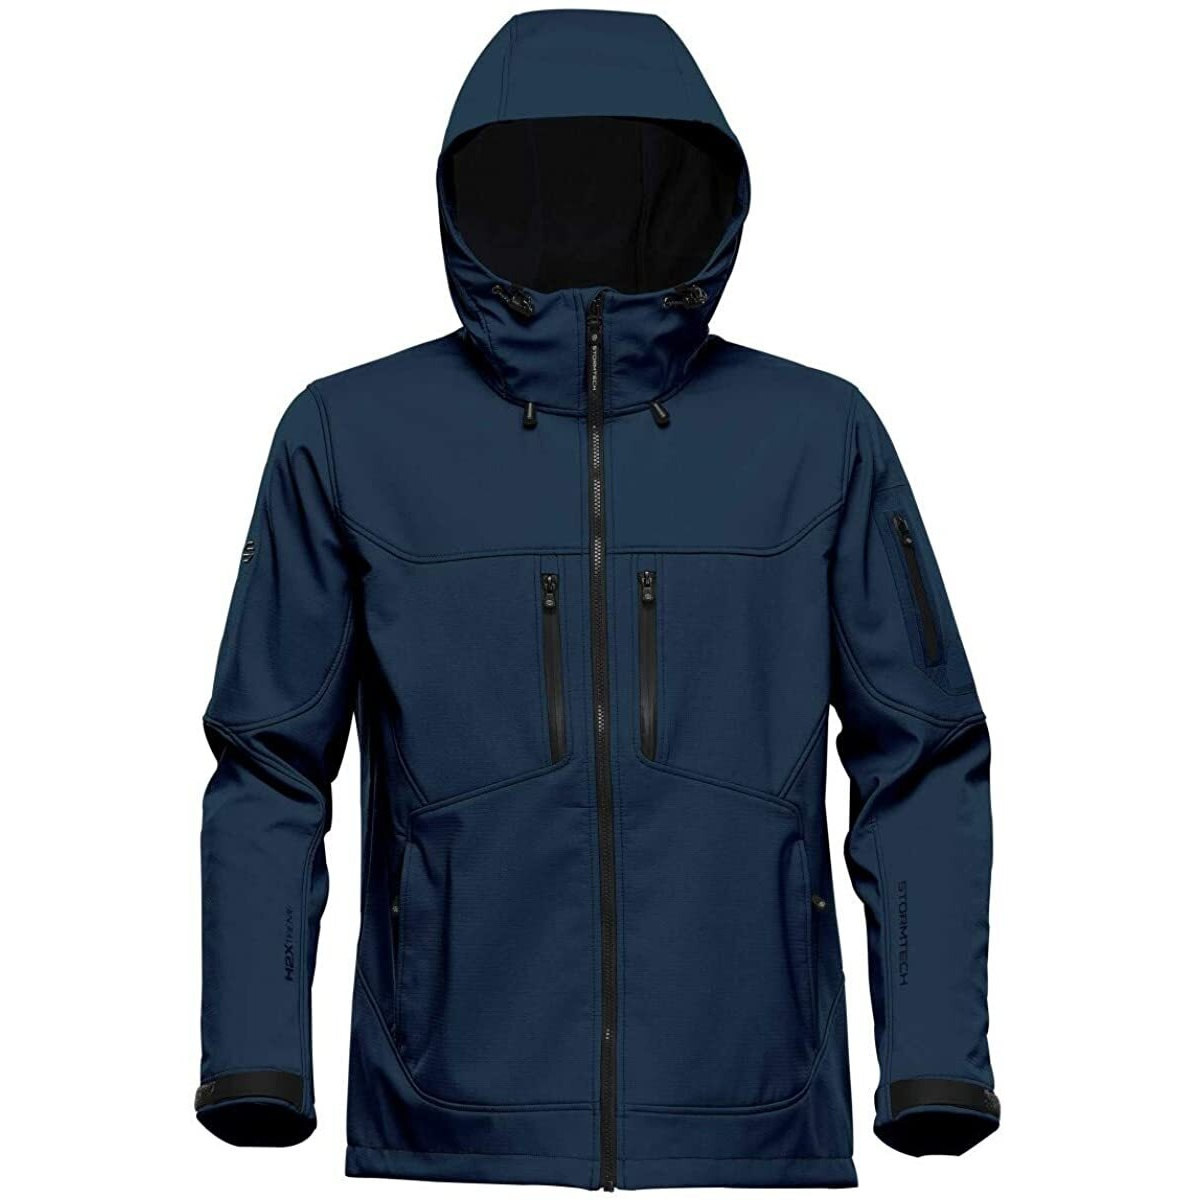 Stormtech Womens/Ladies Epsilon 2 Soft Shell Jacket (S) (Navy/Graphite)